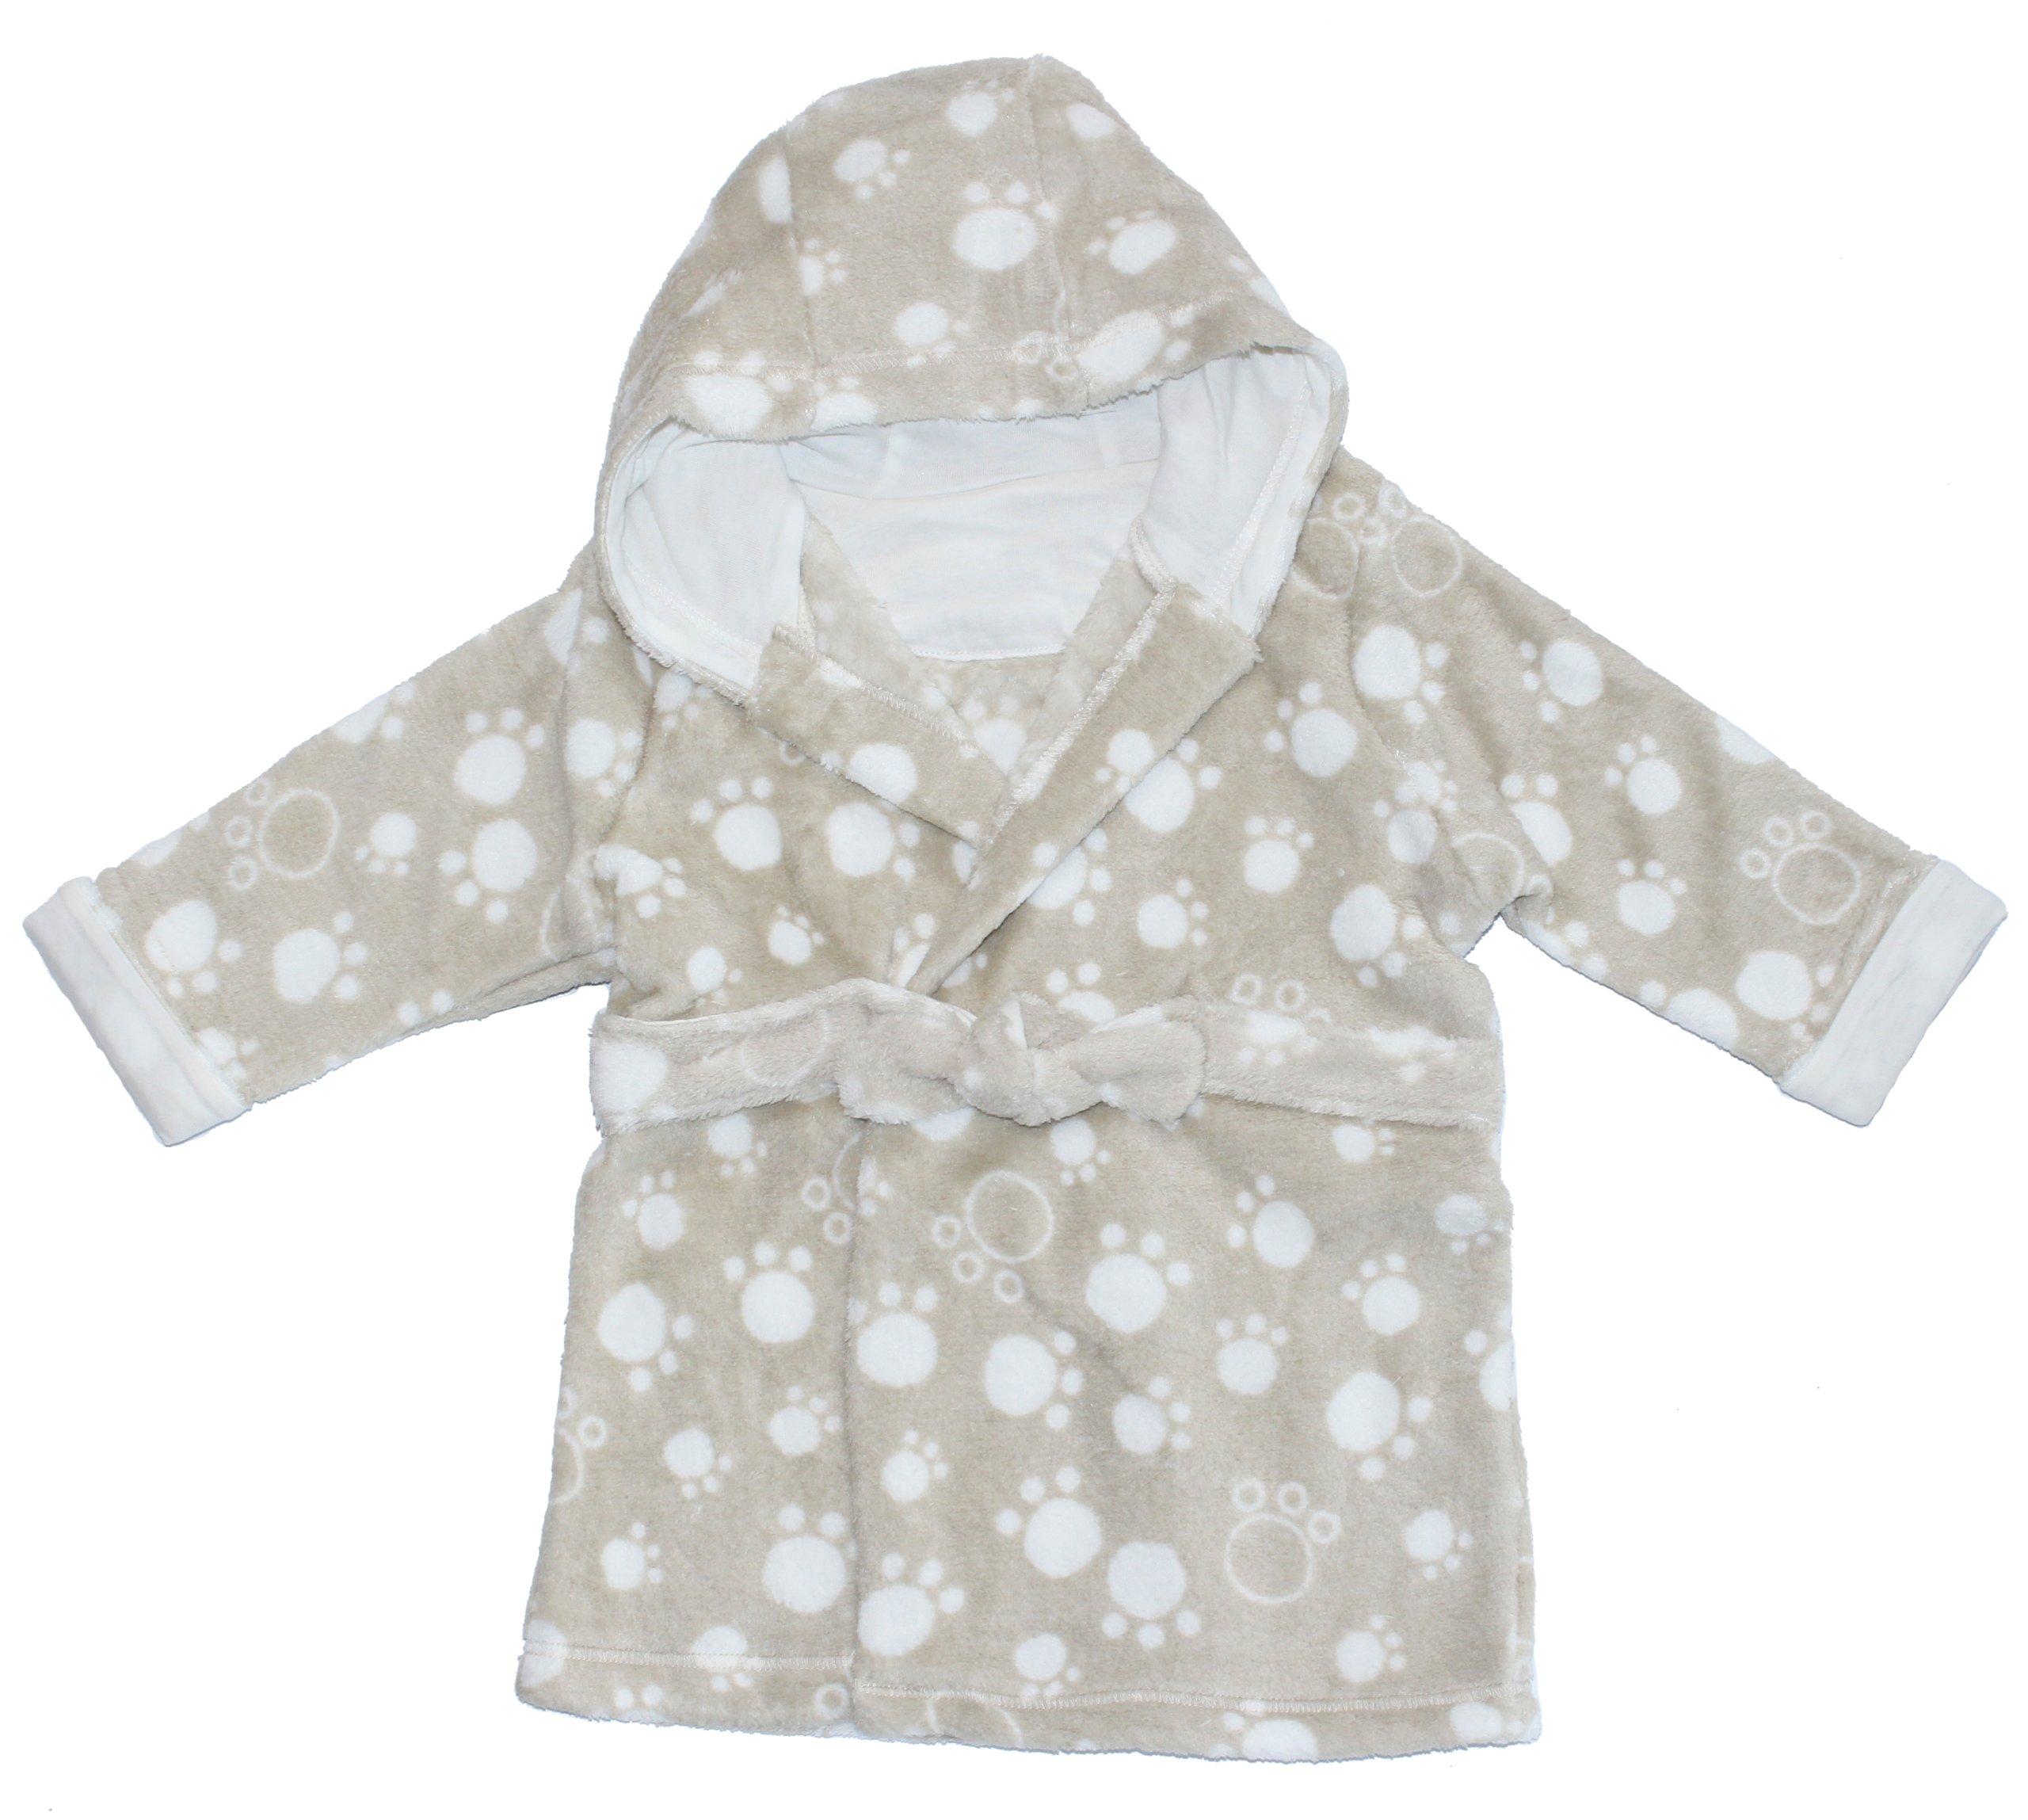 c8aaa897fb906c szlafrok niemowlęcy kaptur 62 / 0-3 m - 7312121085 - oficjalne ...